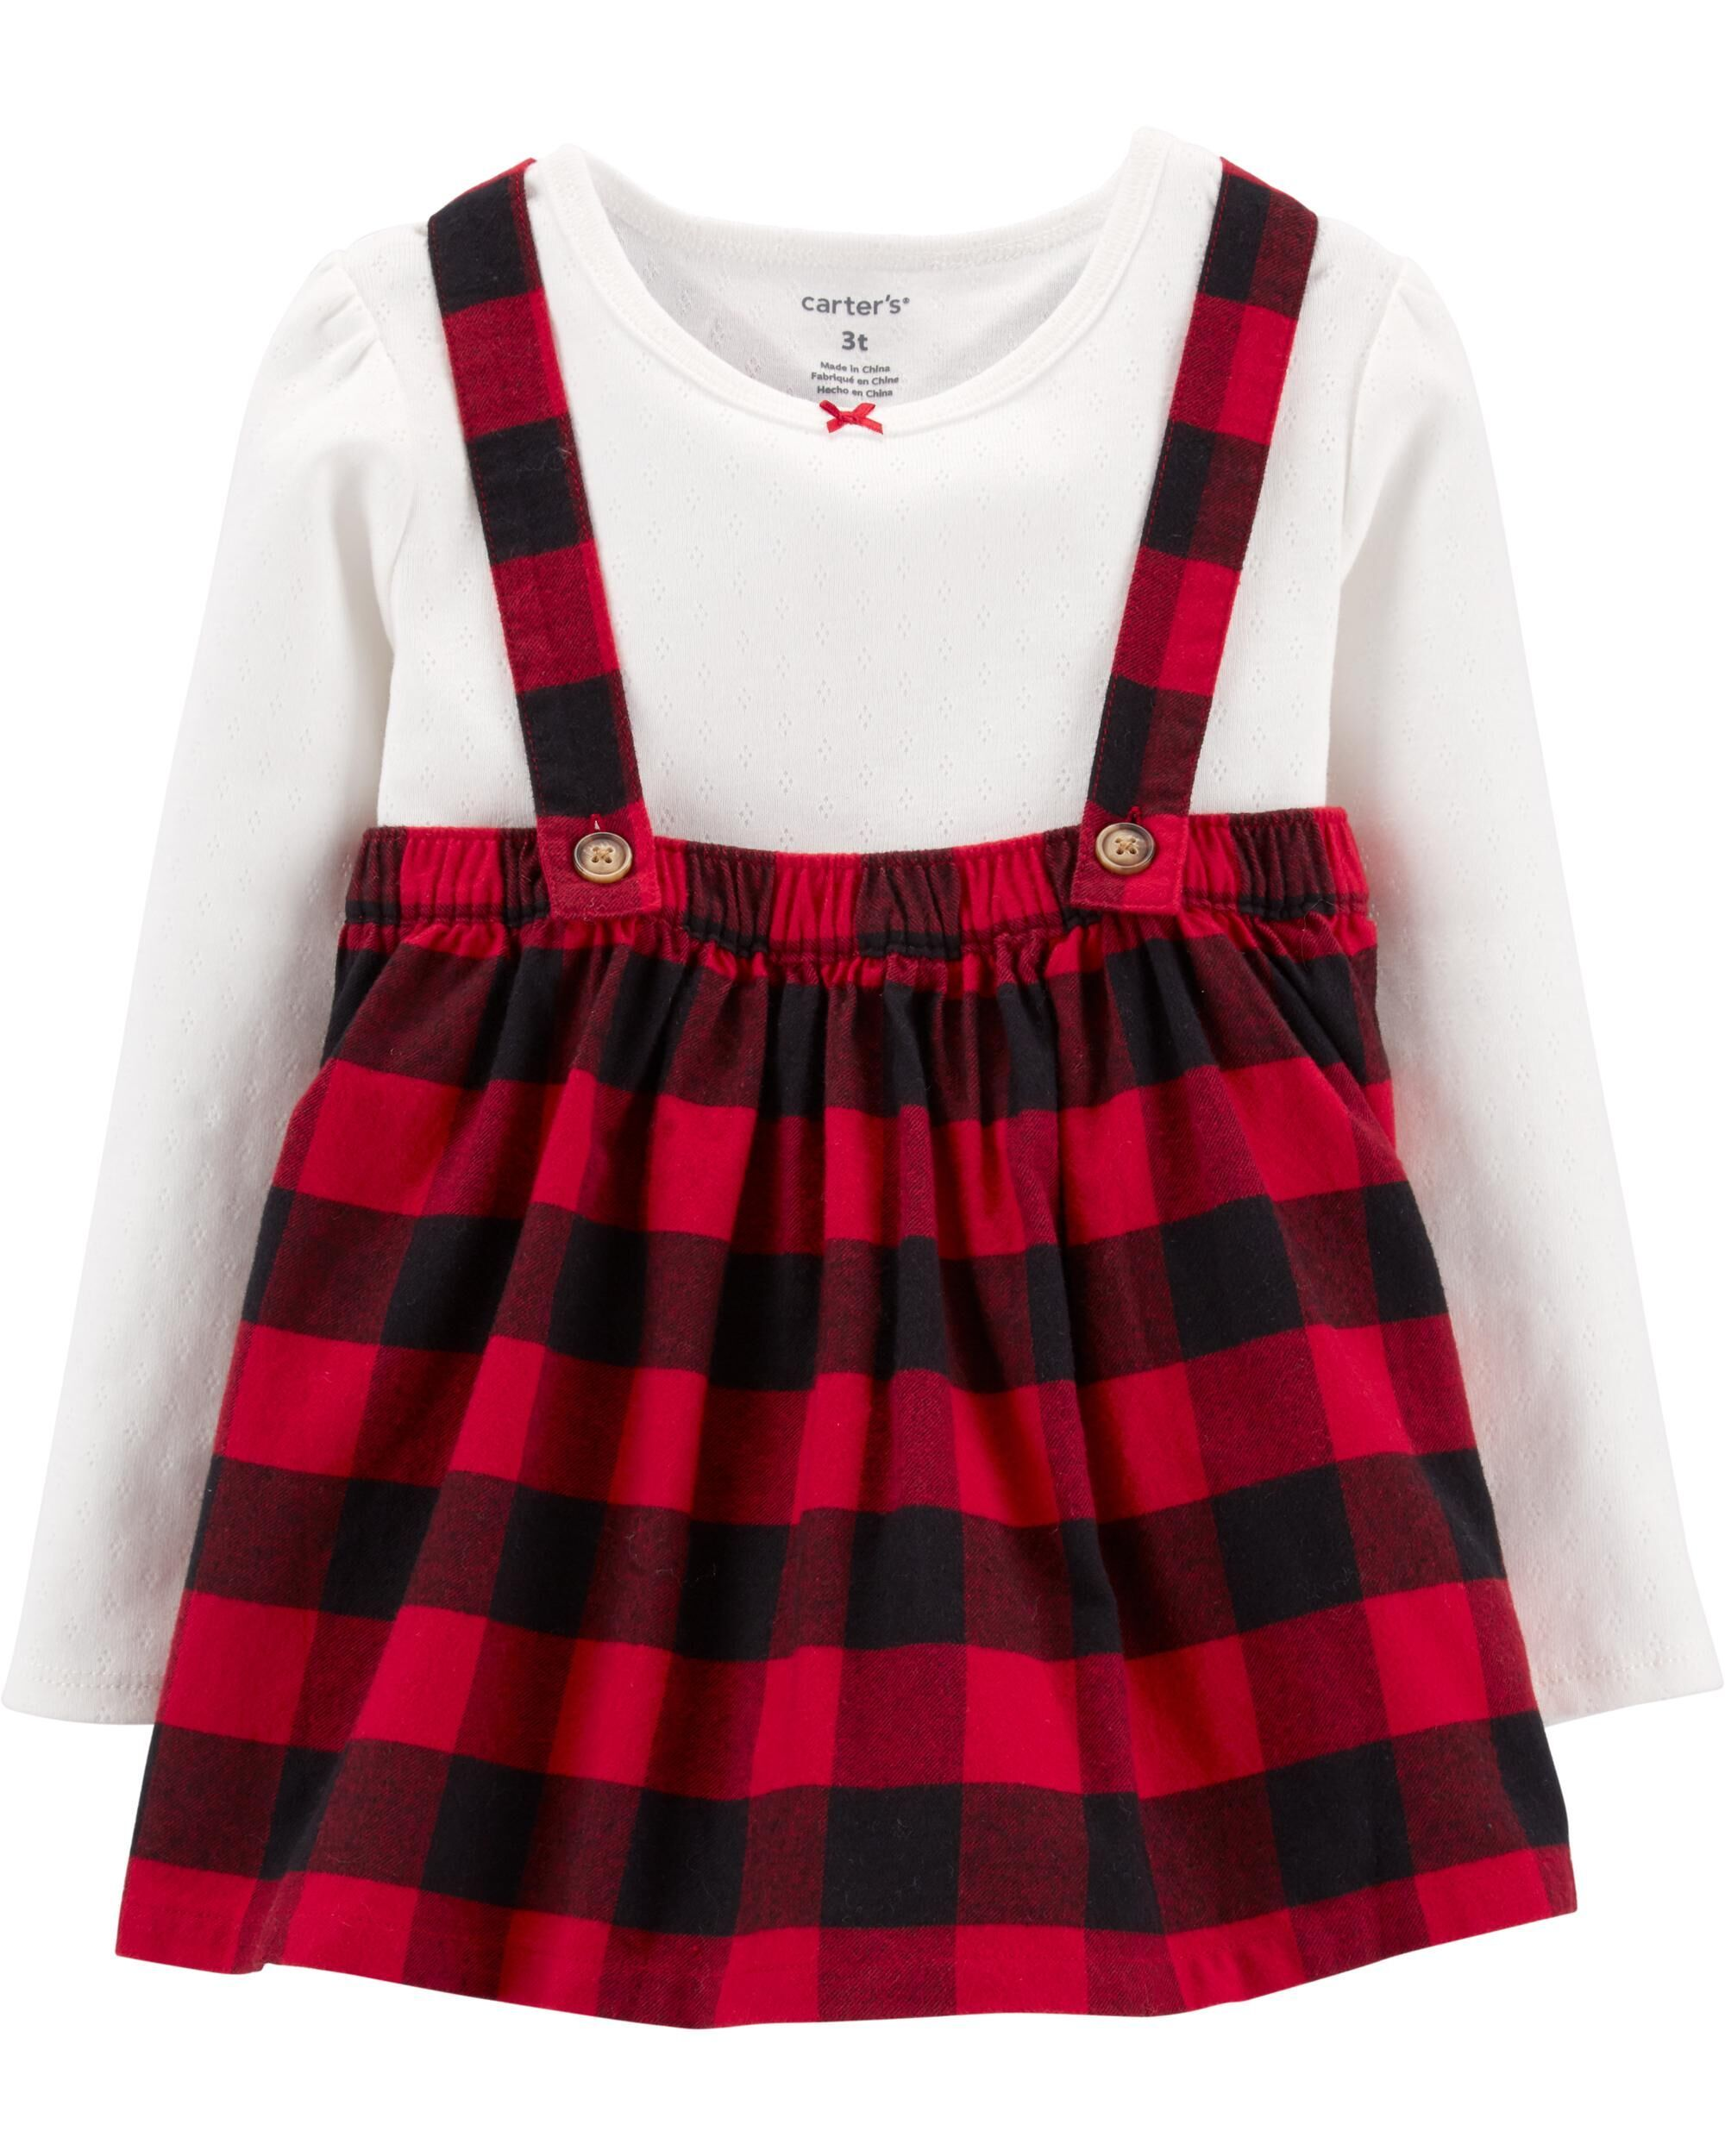 2 Piece Buffalo Check Jumper Set Toddler Girl Outfits